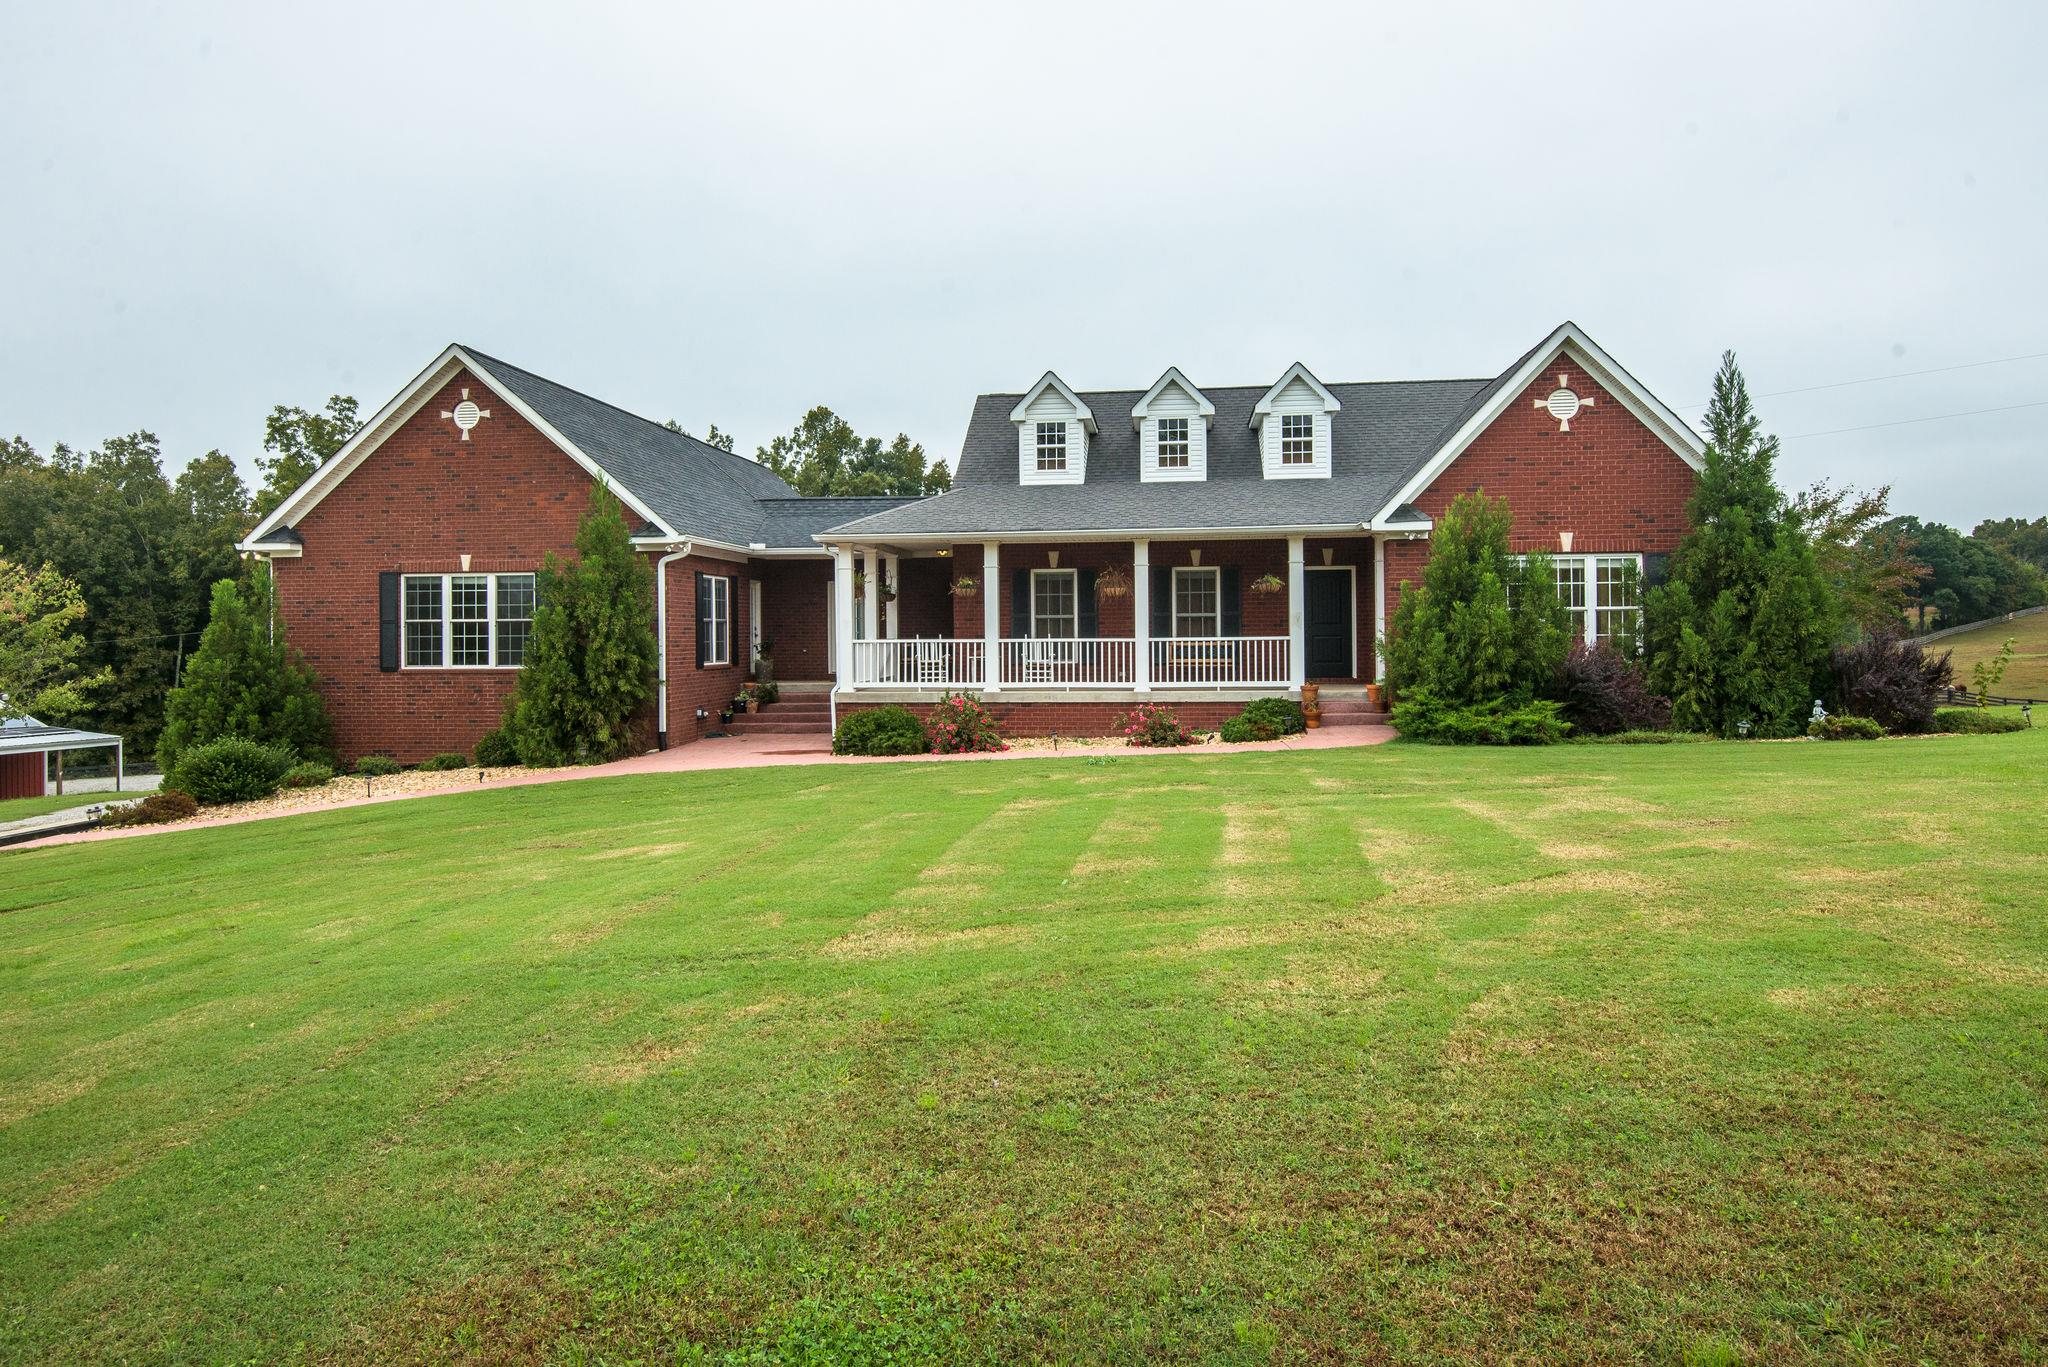 7676 Barnhill Rd, Primm Springs, TN 38476 - Primm Springs, TN real estate listing